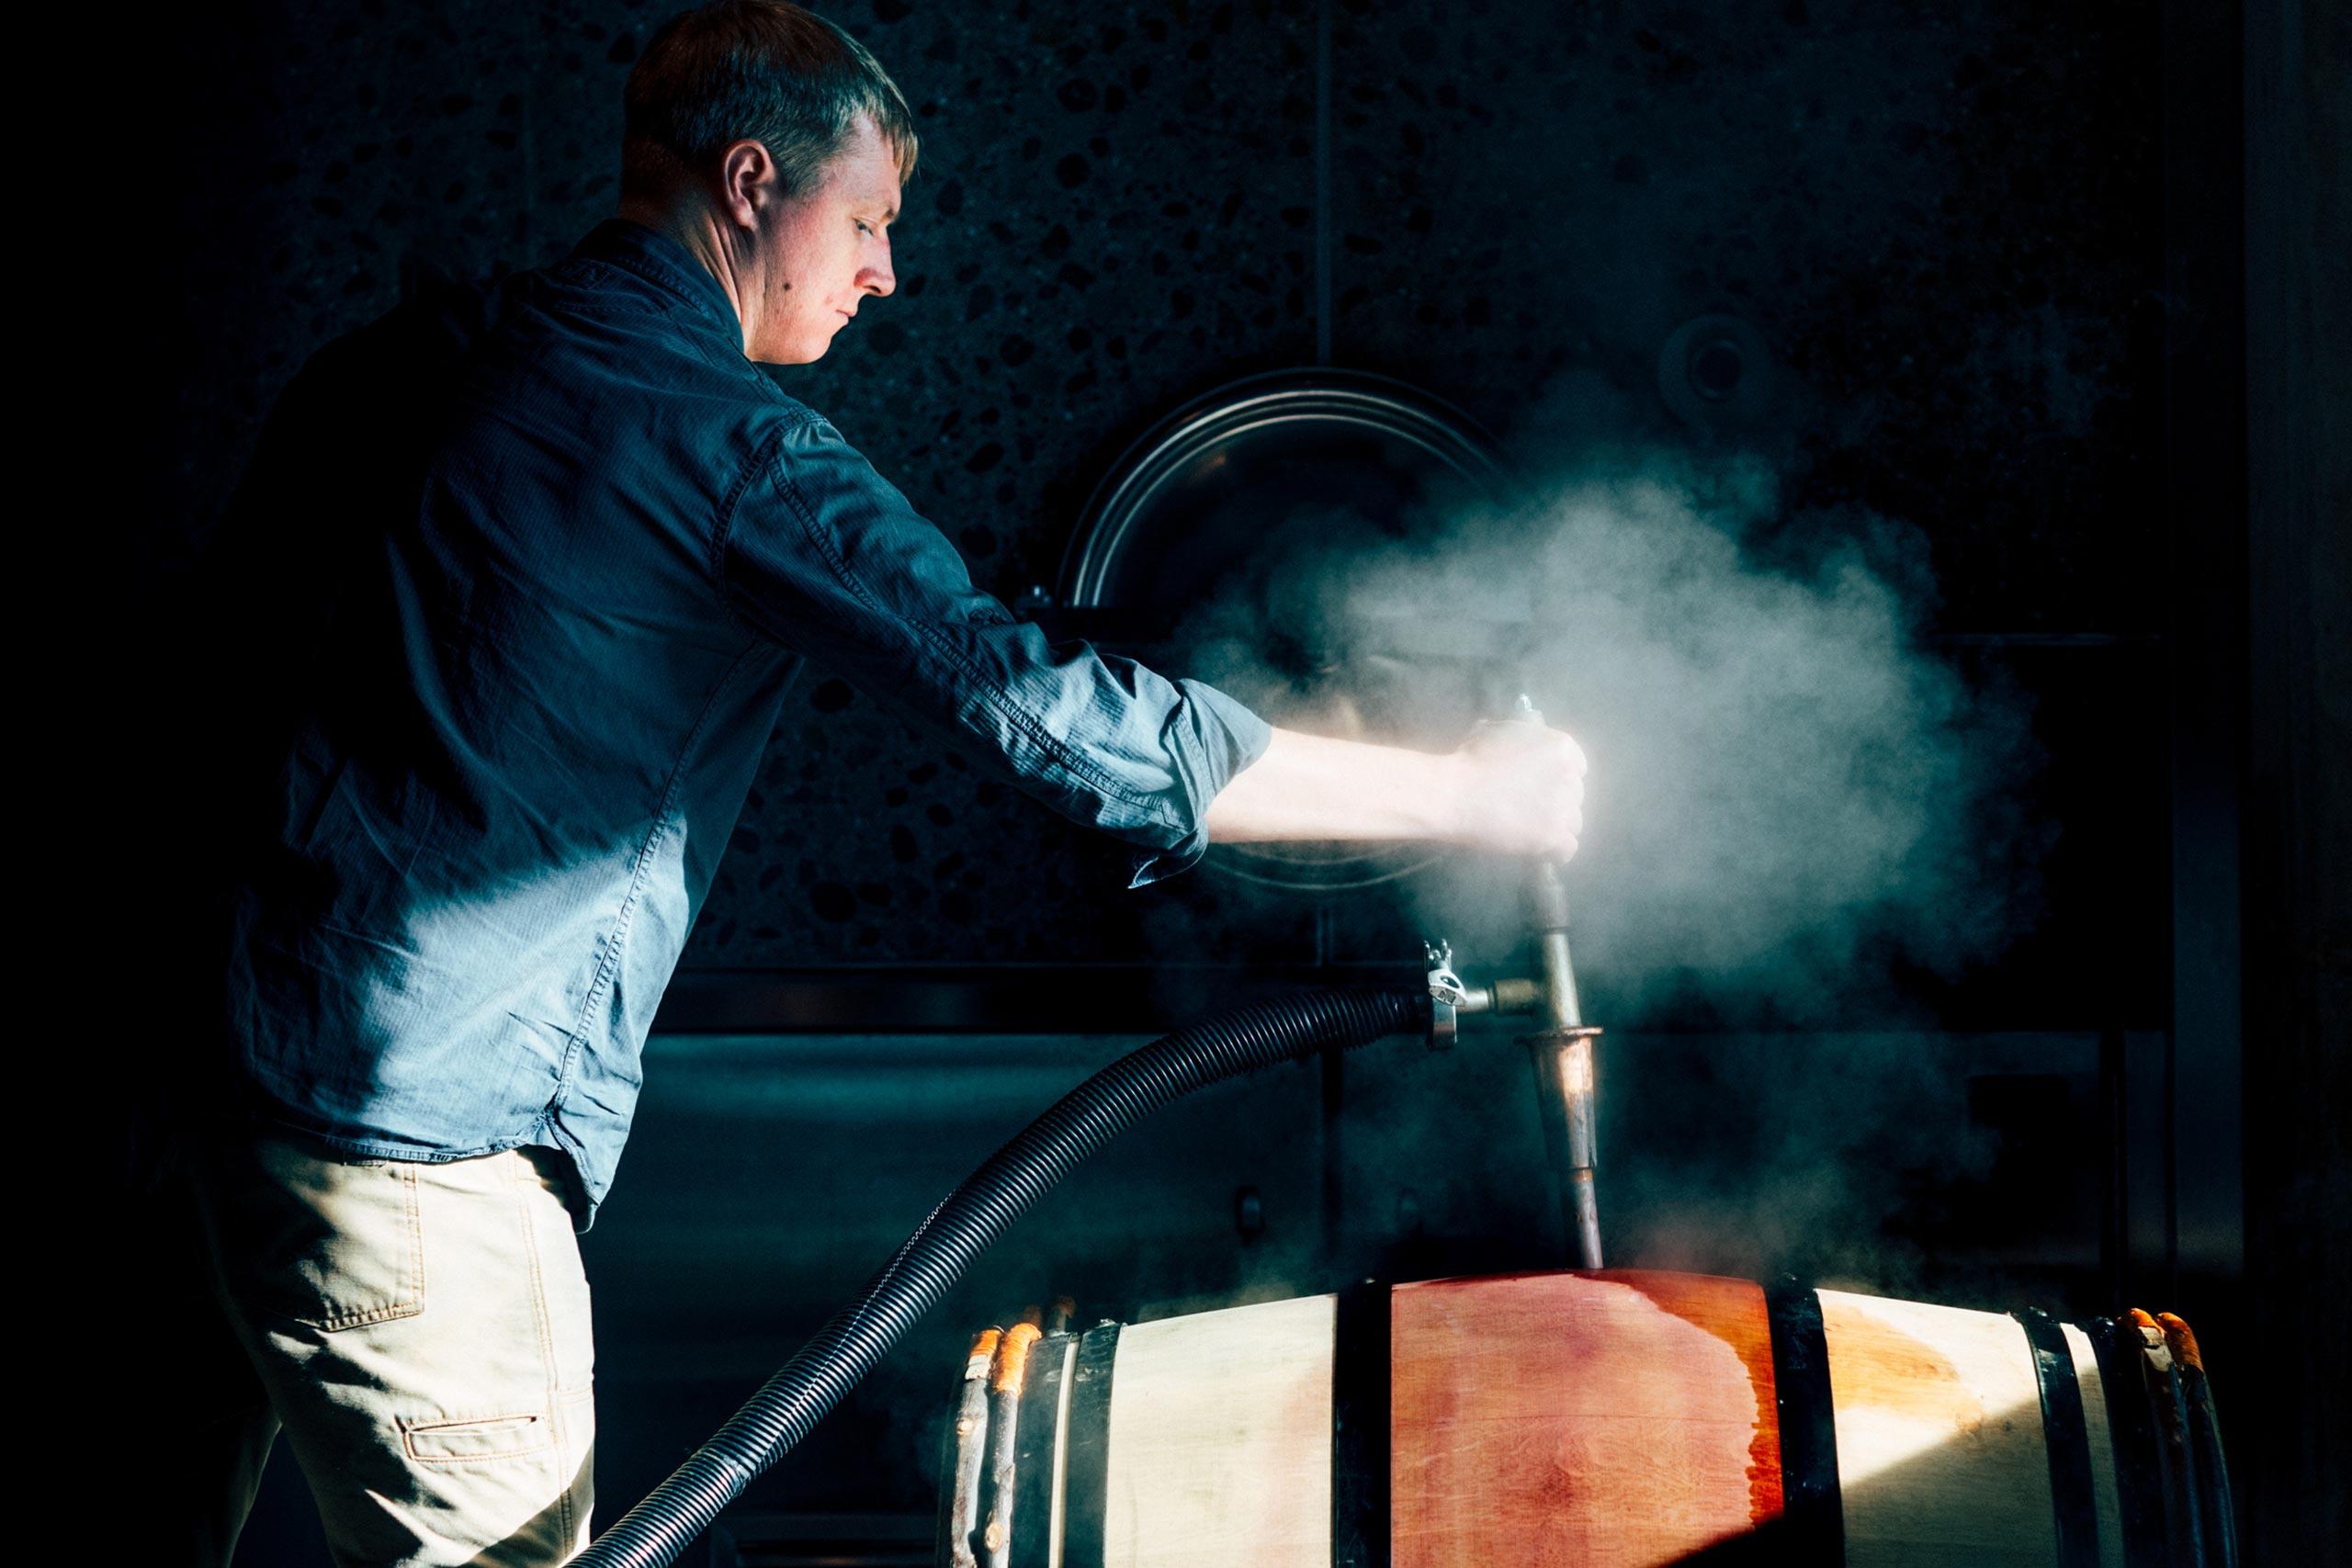 Austin Peterson steaming a barrel